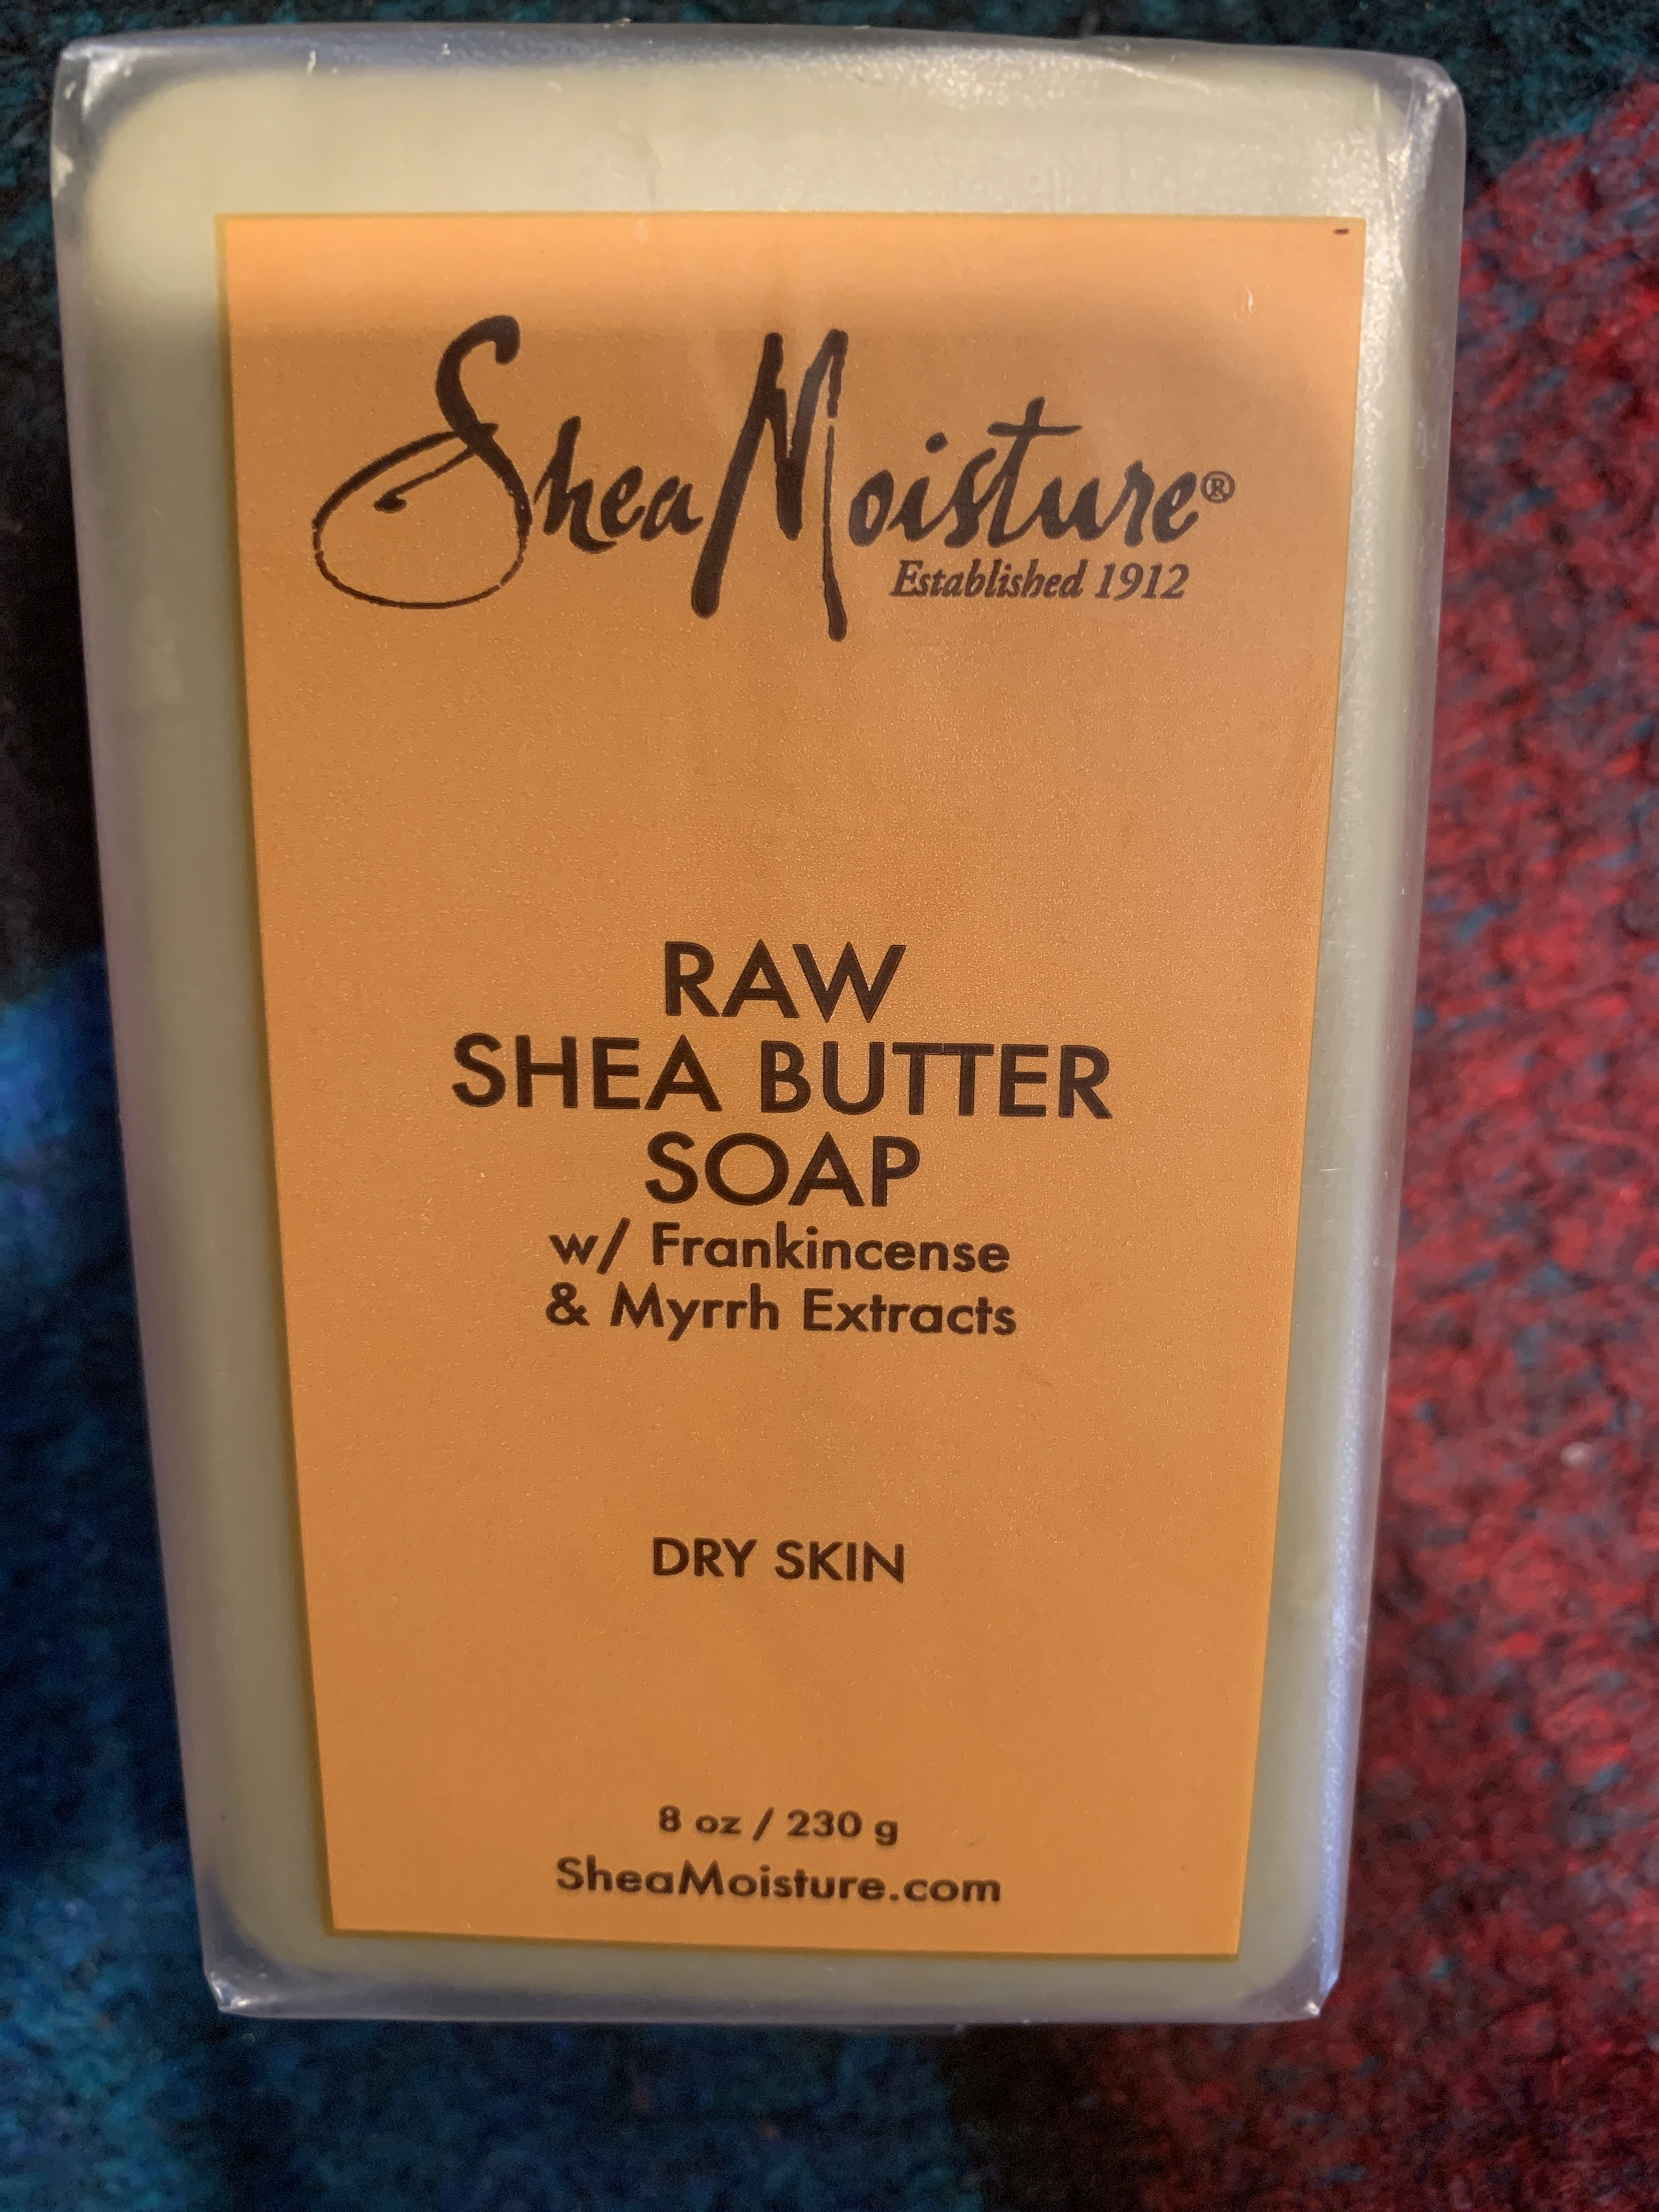 SheaMoisture Raw Shea Butter Soap